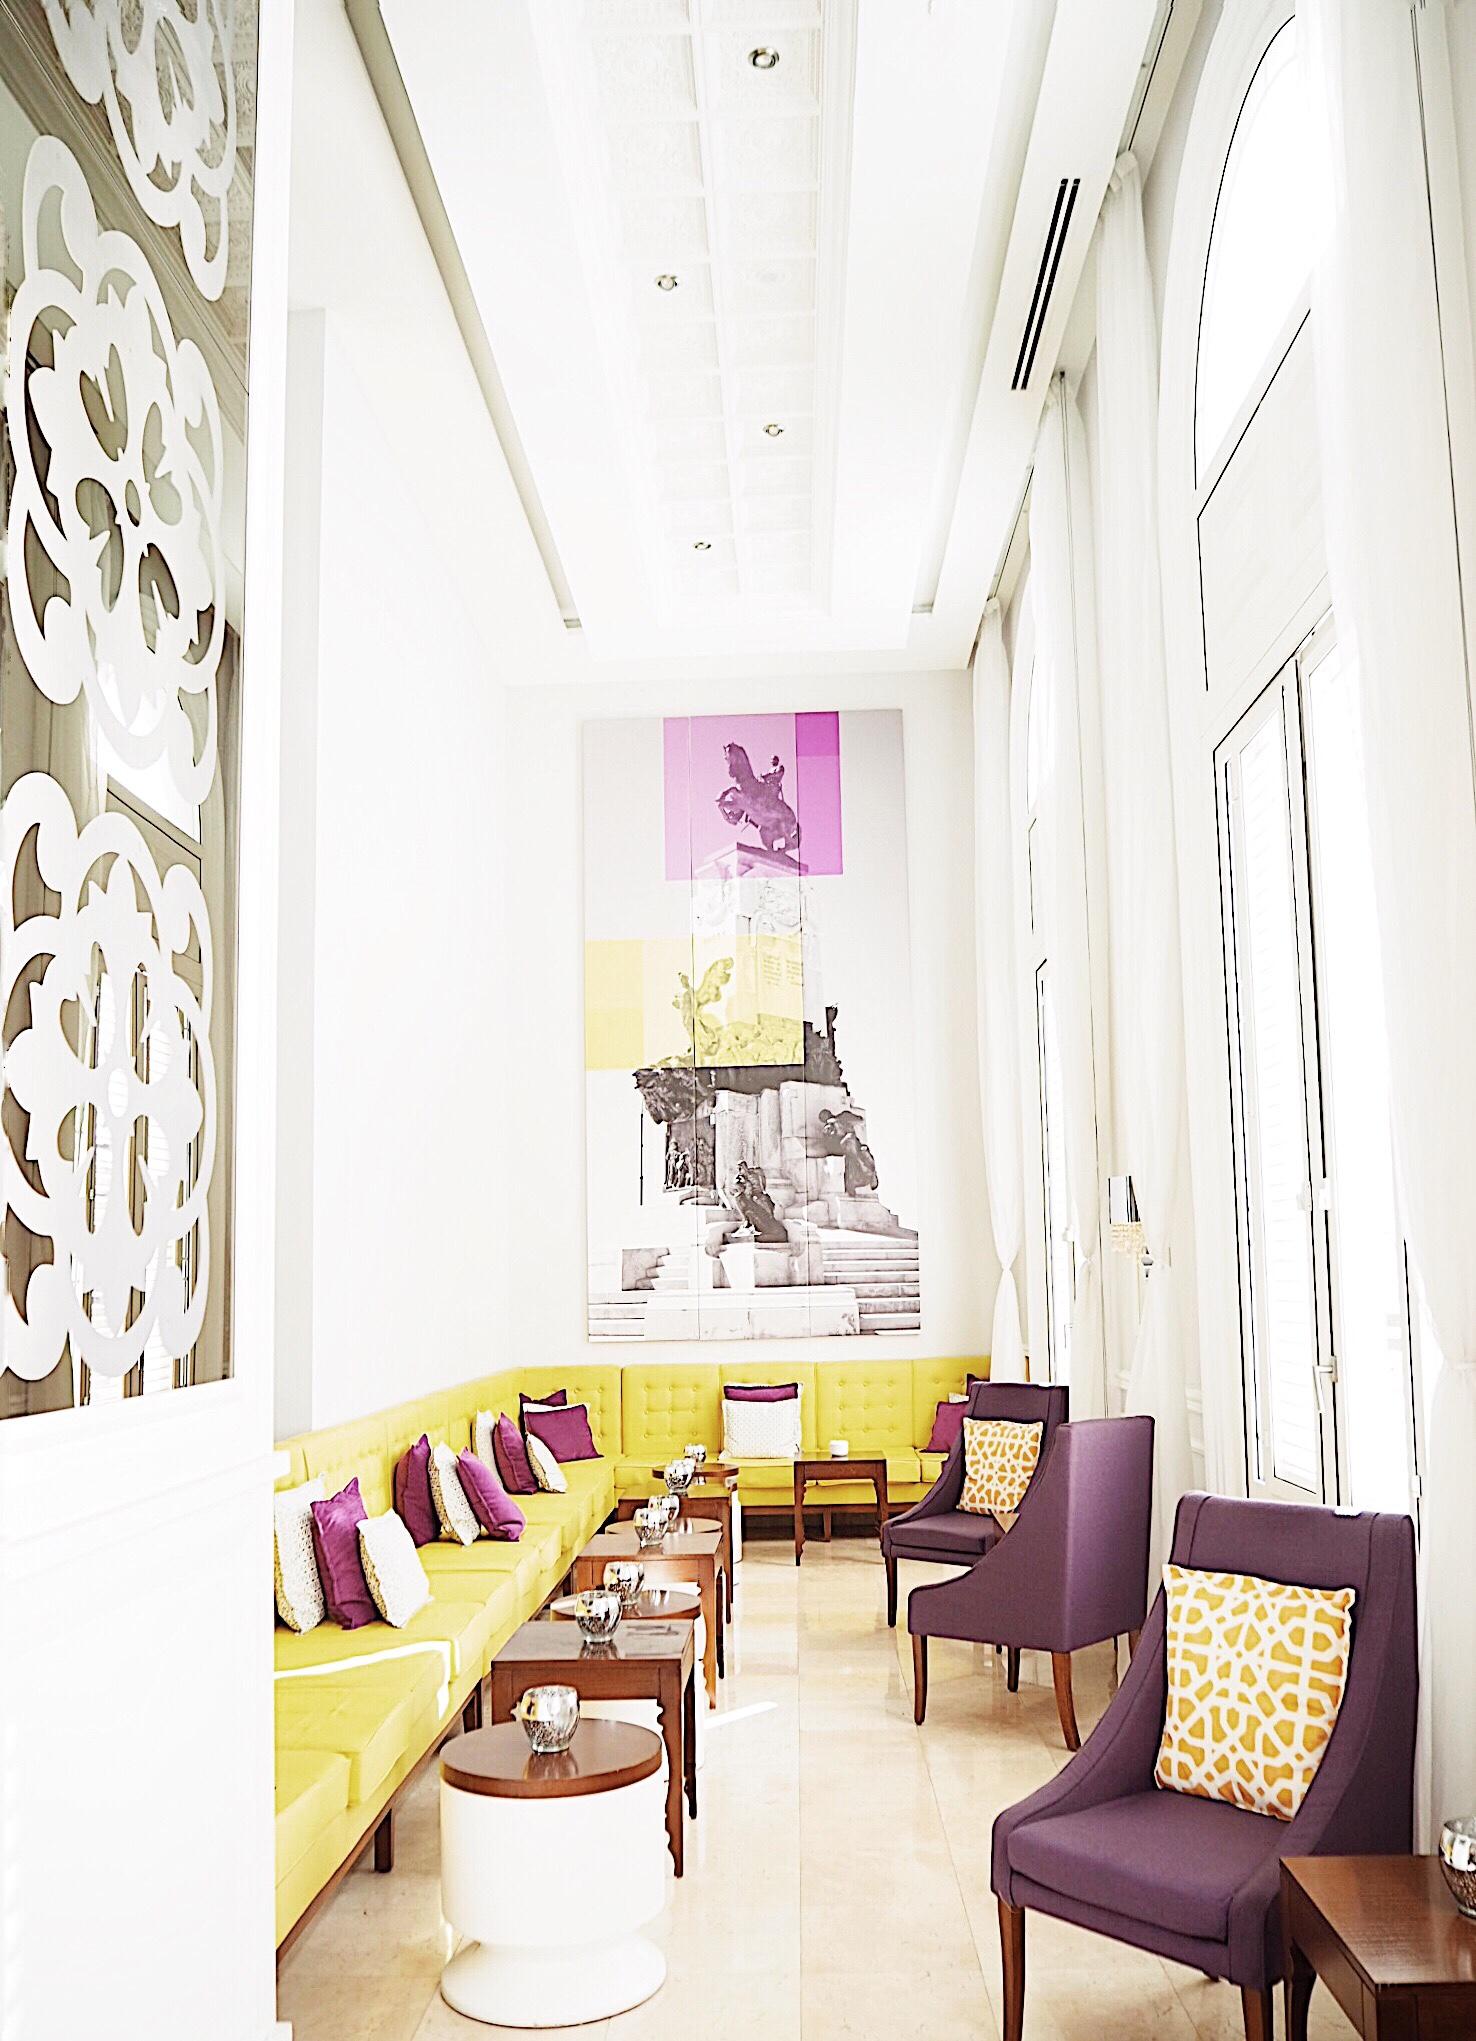 30979dbd 62b2 4984 83ff f49d546fdf5b - Kempinski Hotel - 2017年オープンのハバナで今1番と言われる五つ星ラグジュアリーホテル